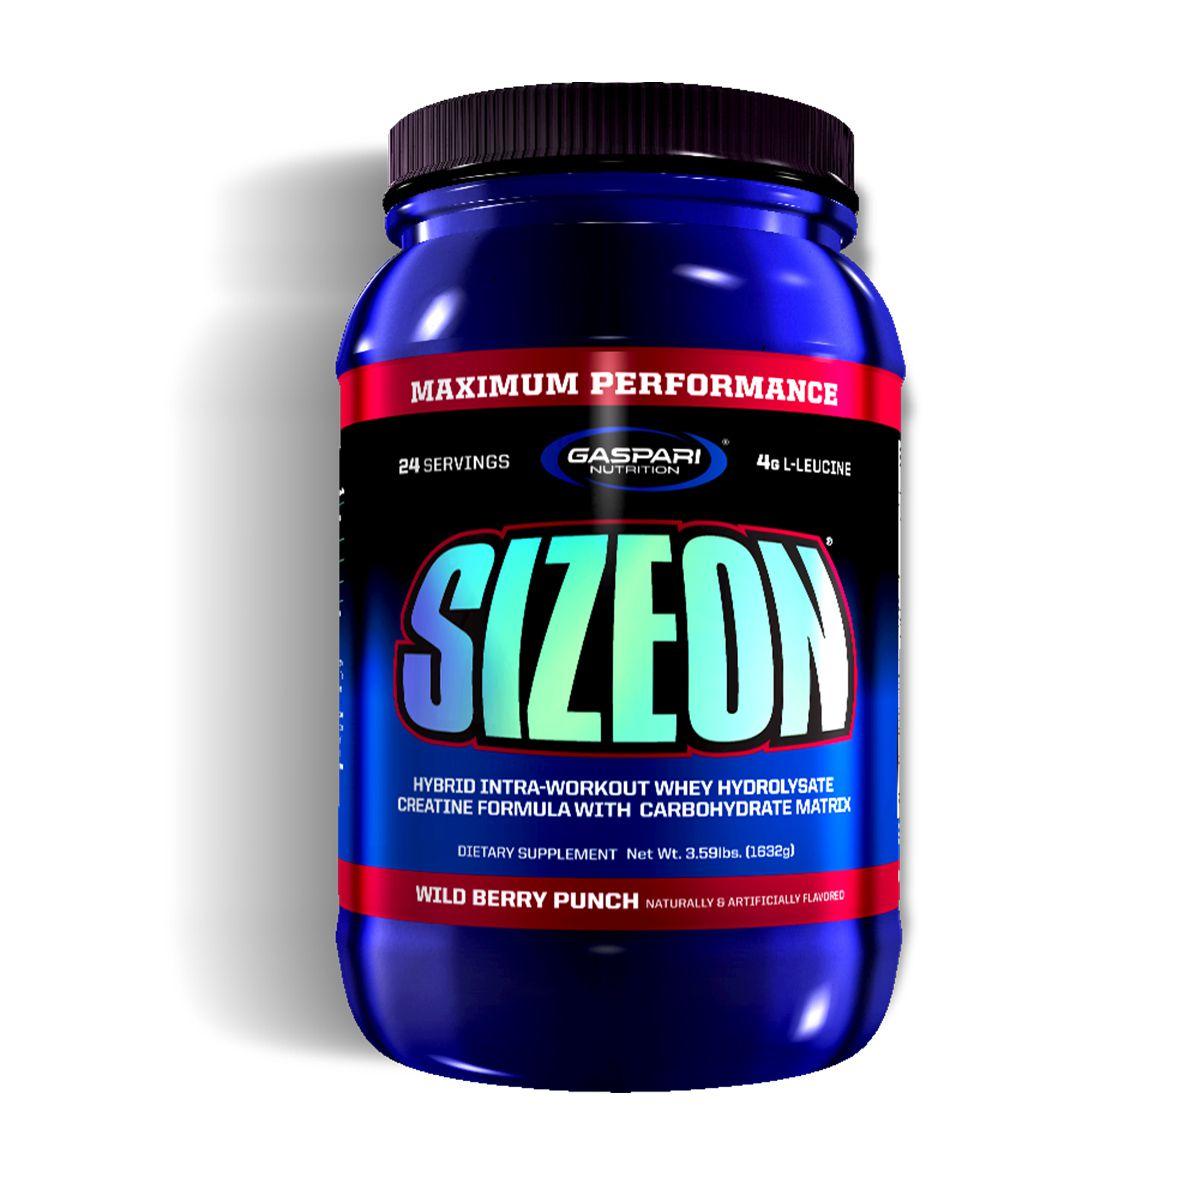 Sizeon Intra Treino - 1,5Kg - Gaspari Nutrition